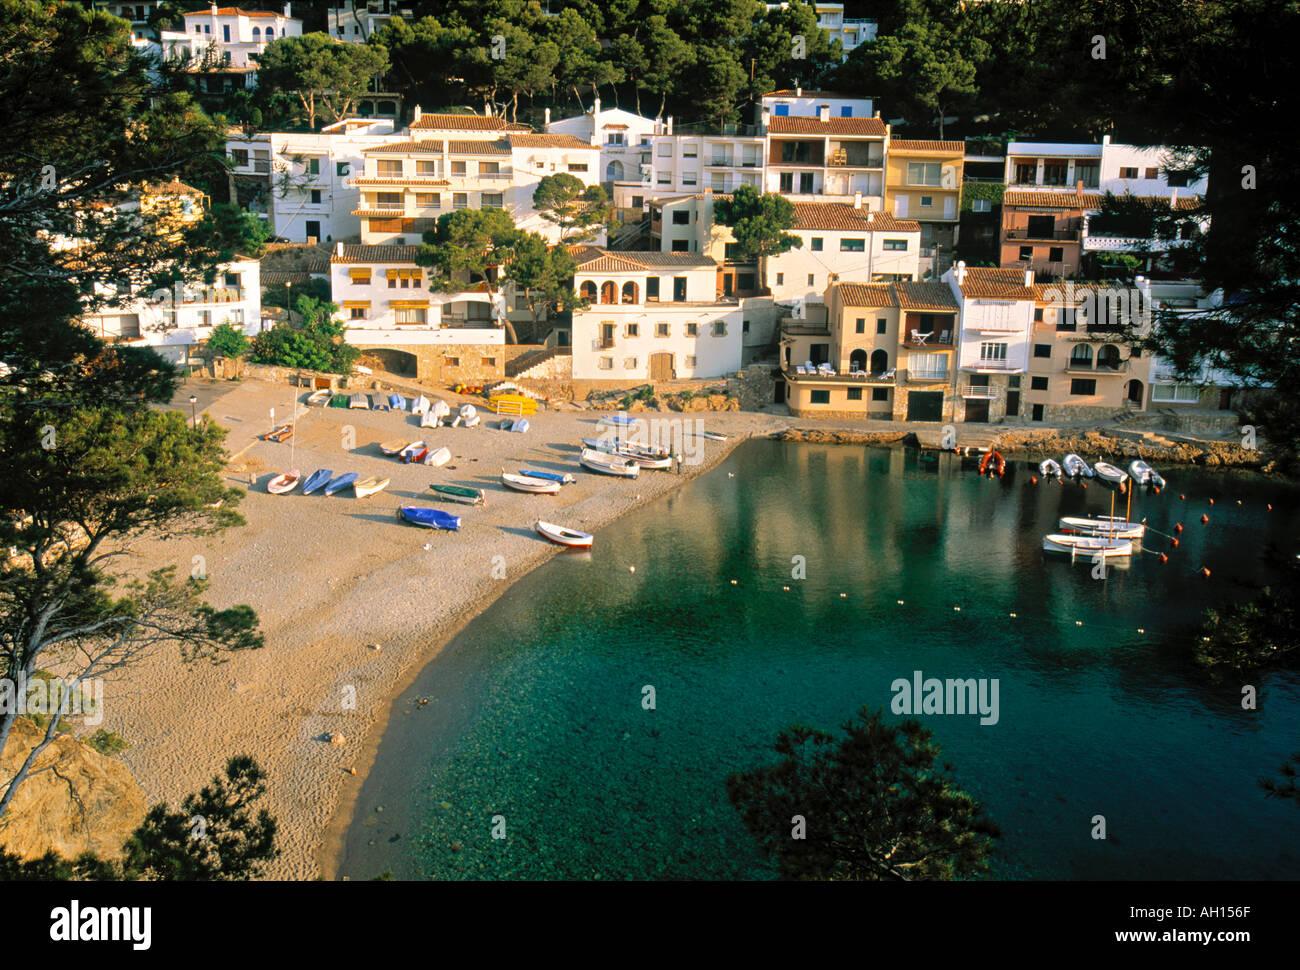 Sa Tuna nr Begur Costa Brava Spain - Stock Image